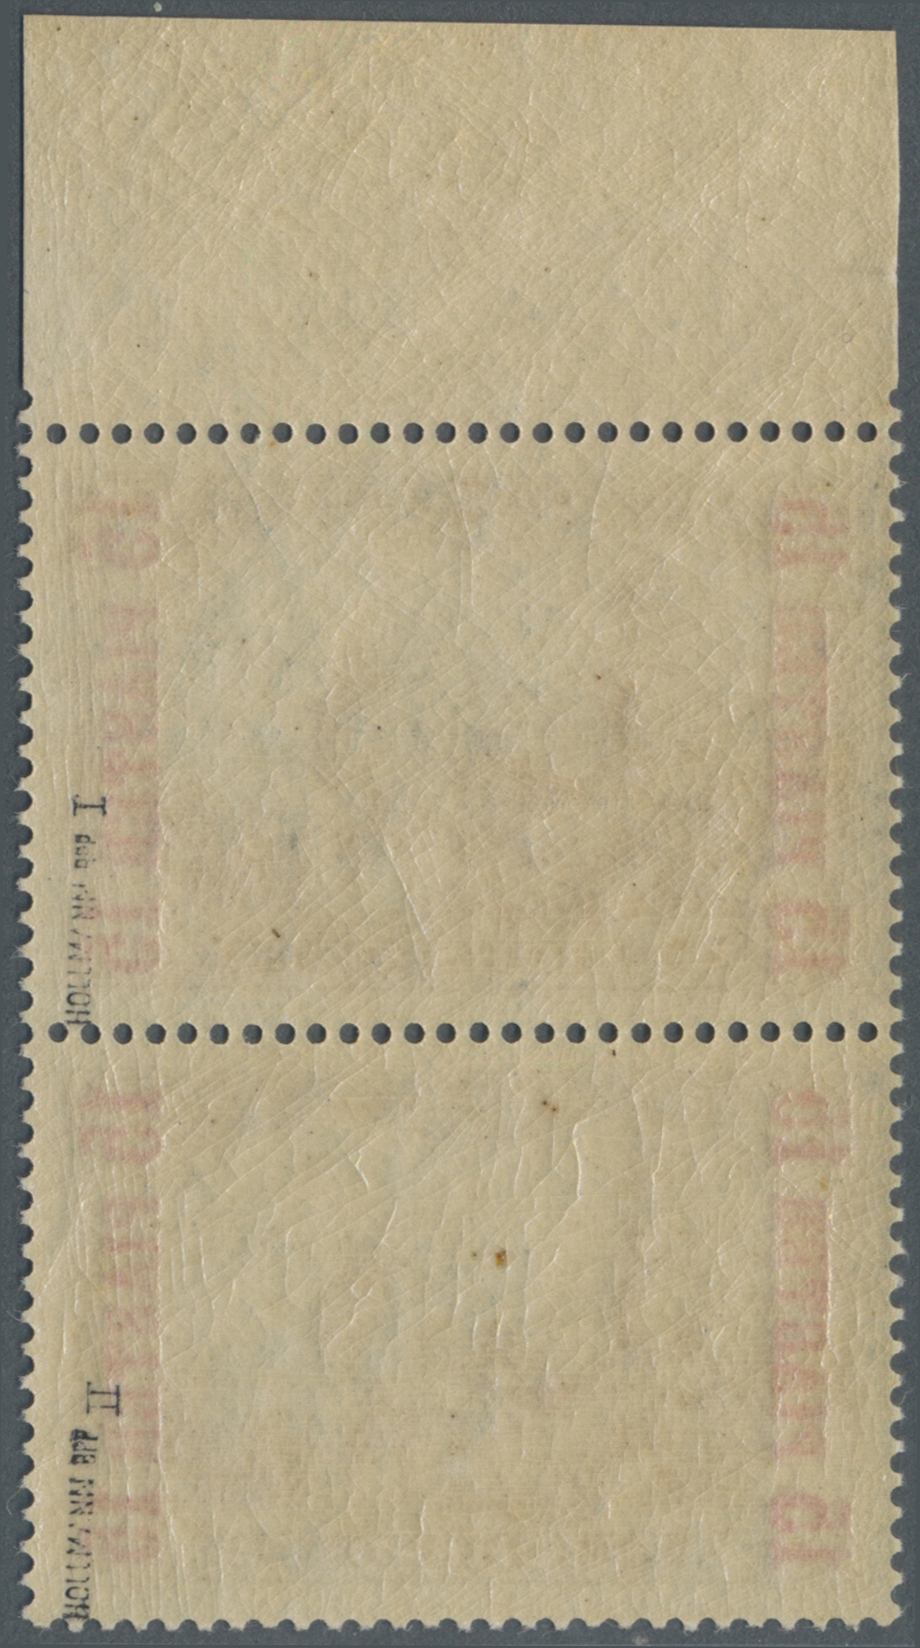 Lot 22132 - deutsche post in der türkei  -  Auktionshaus Christoph Gärtner GmbH & Co. KG Single lots Germany + Picture Postcards. Auction #39 Day 5